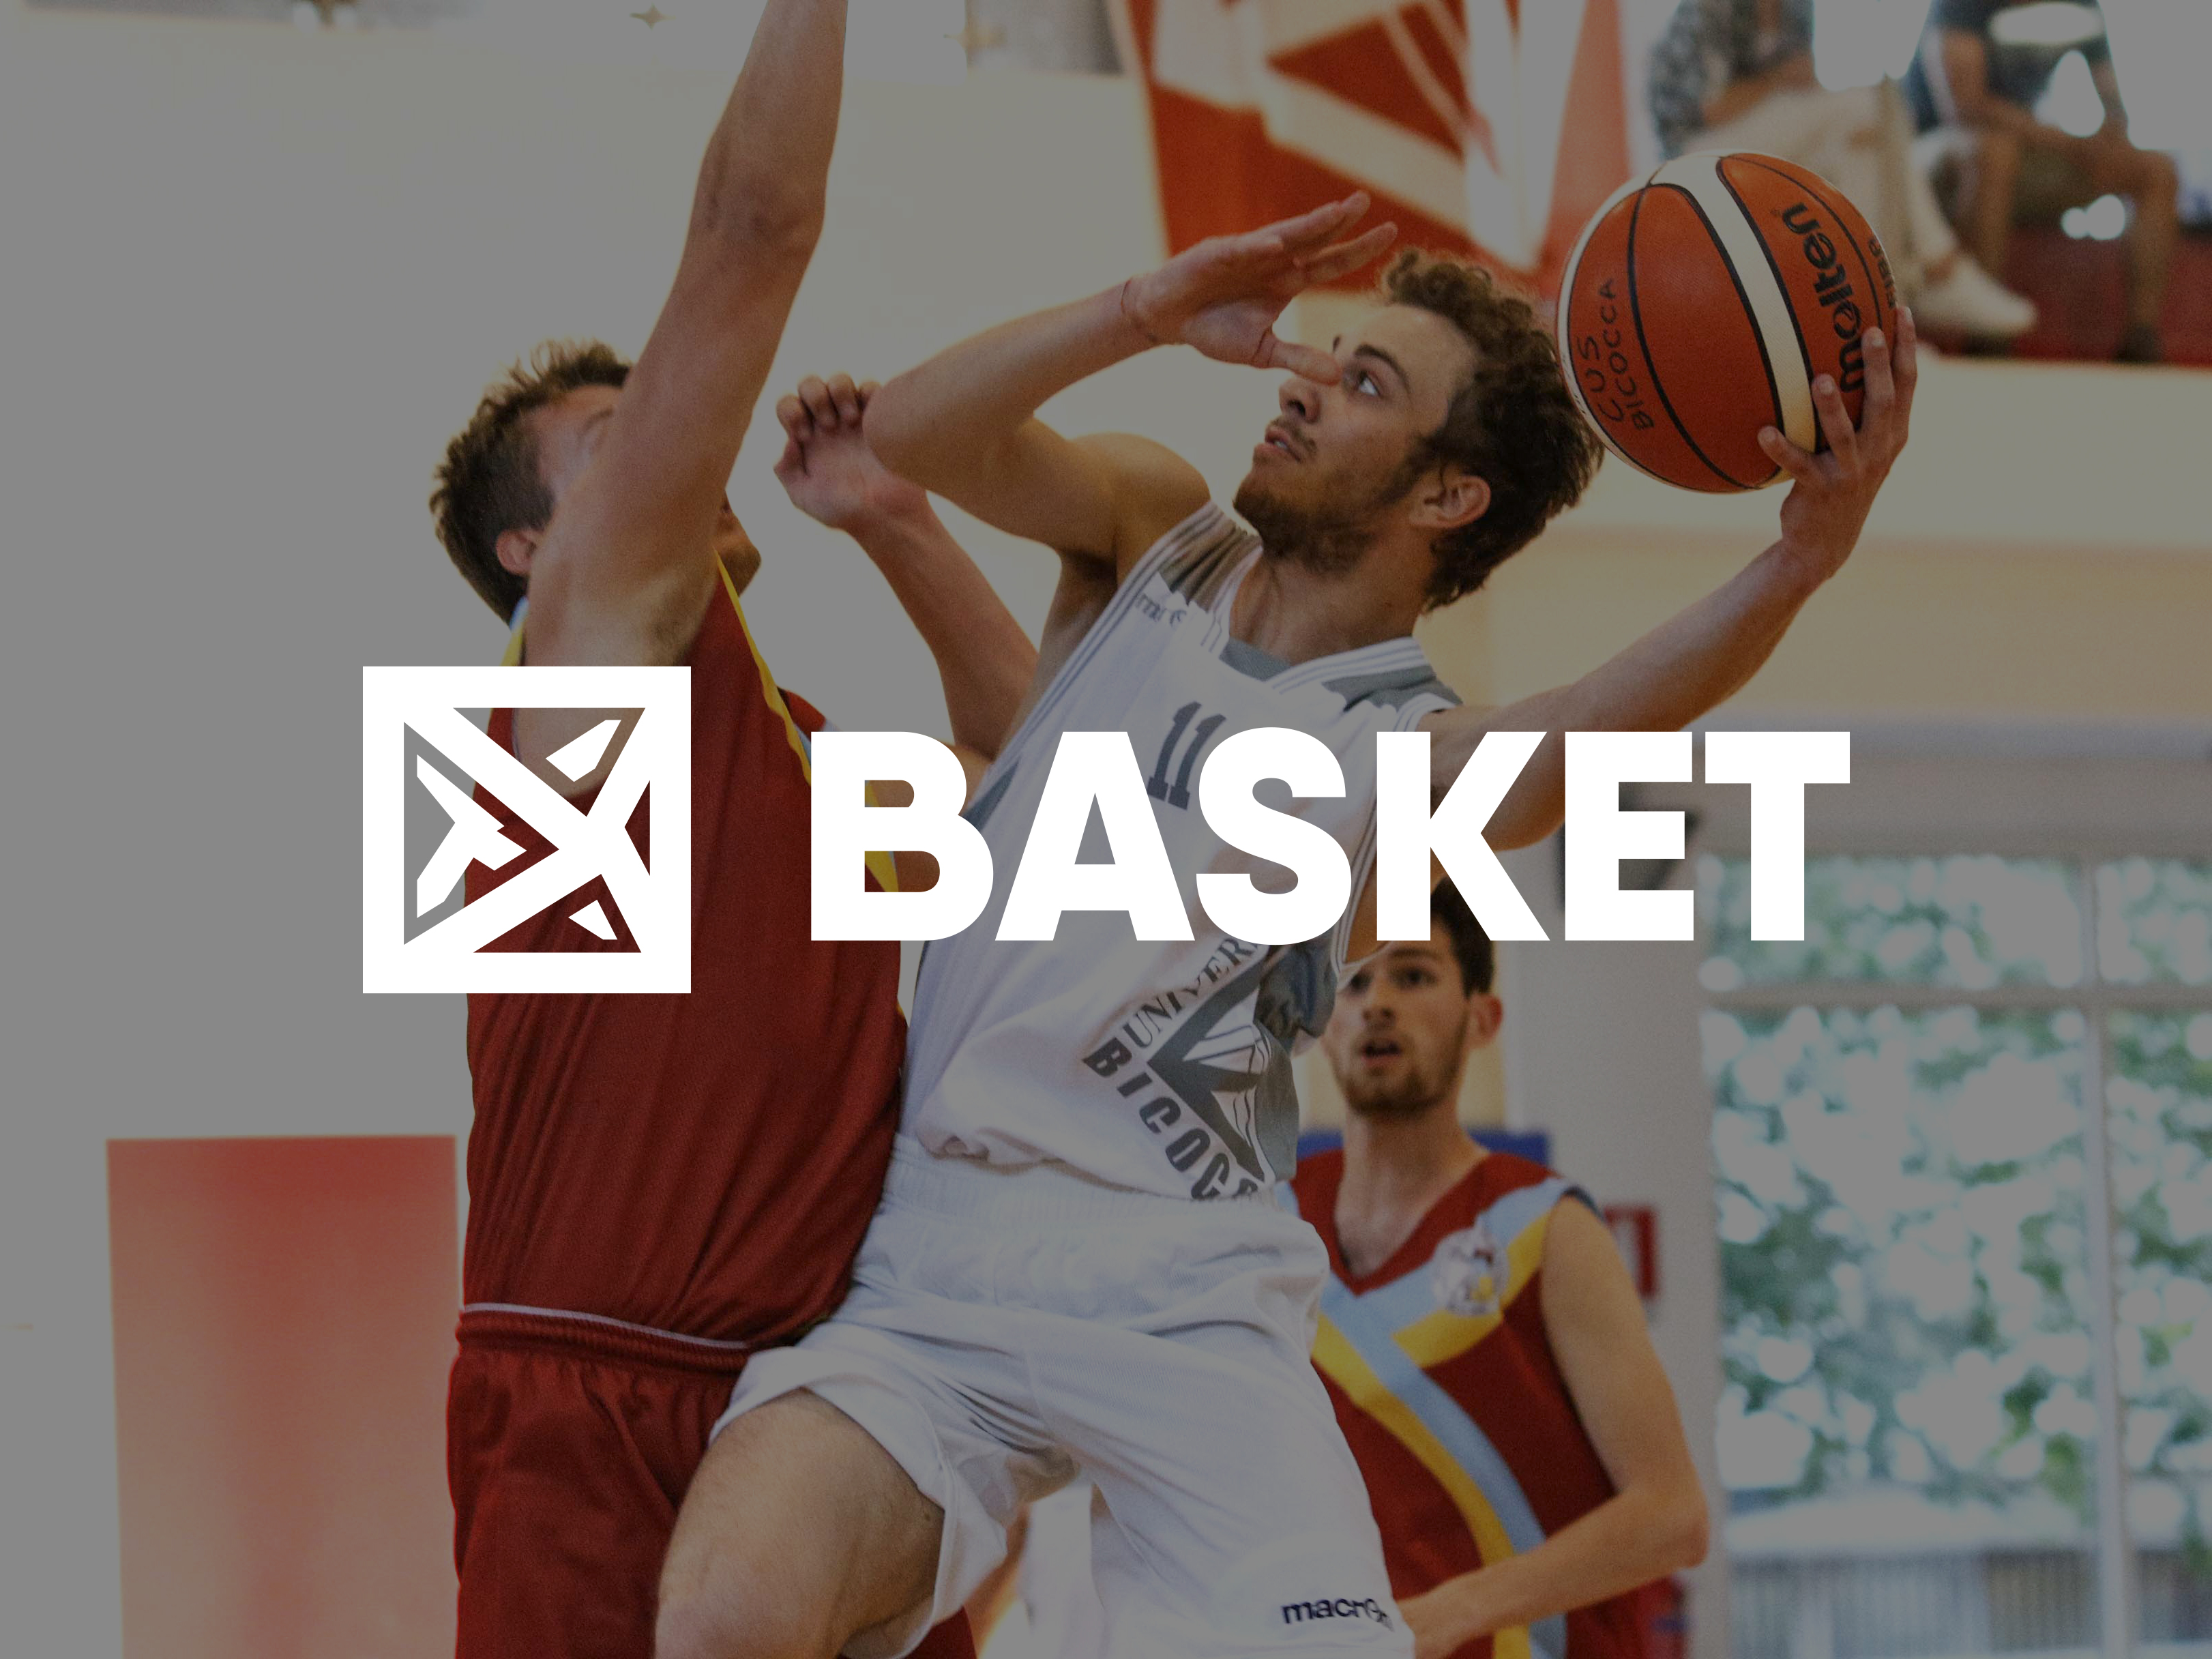 Sport Bicocca: BASKET